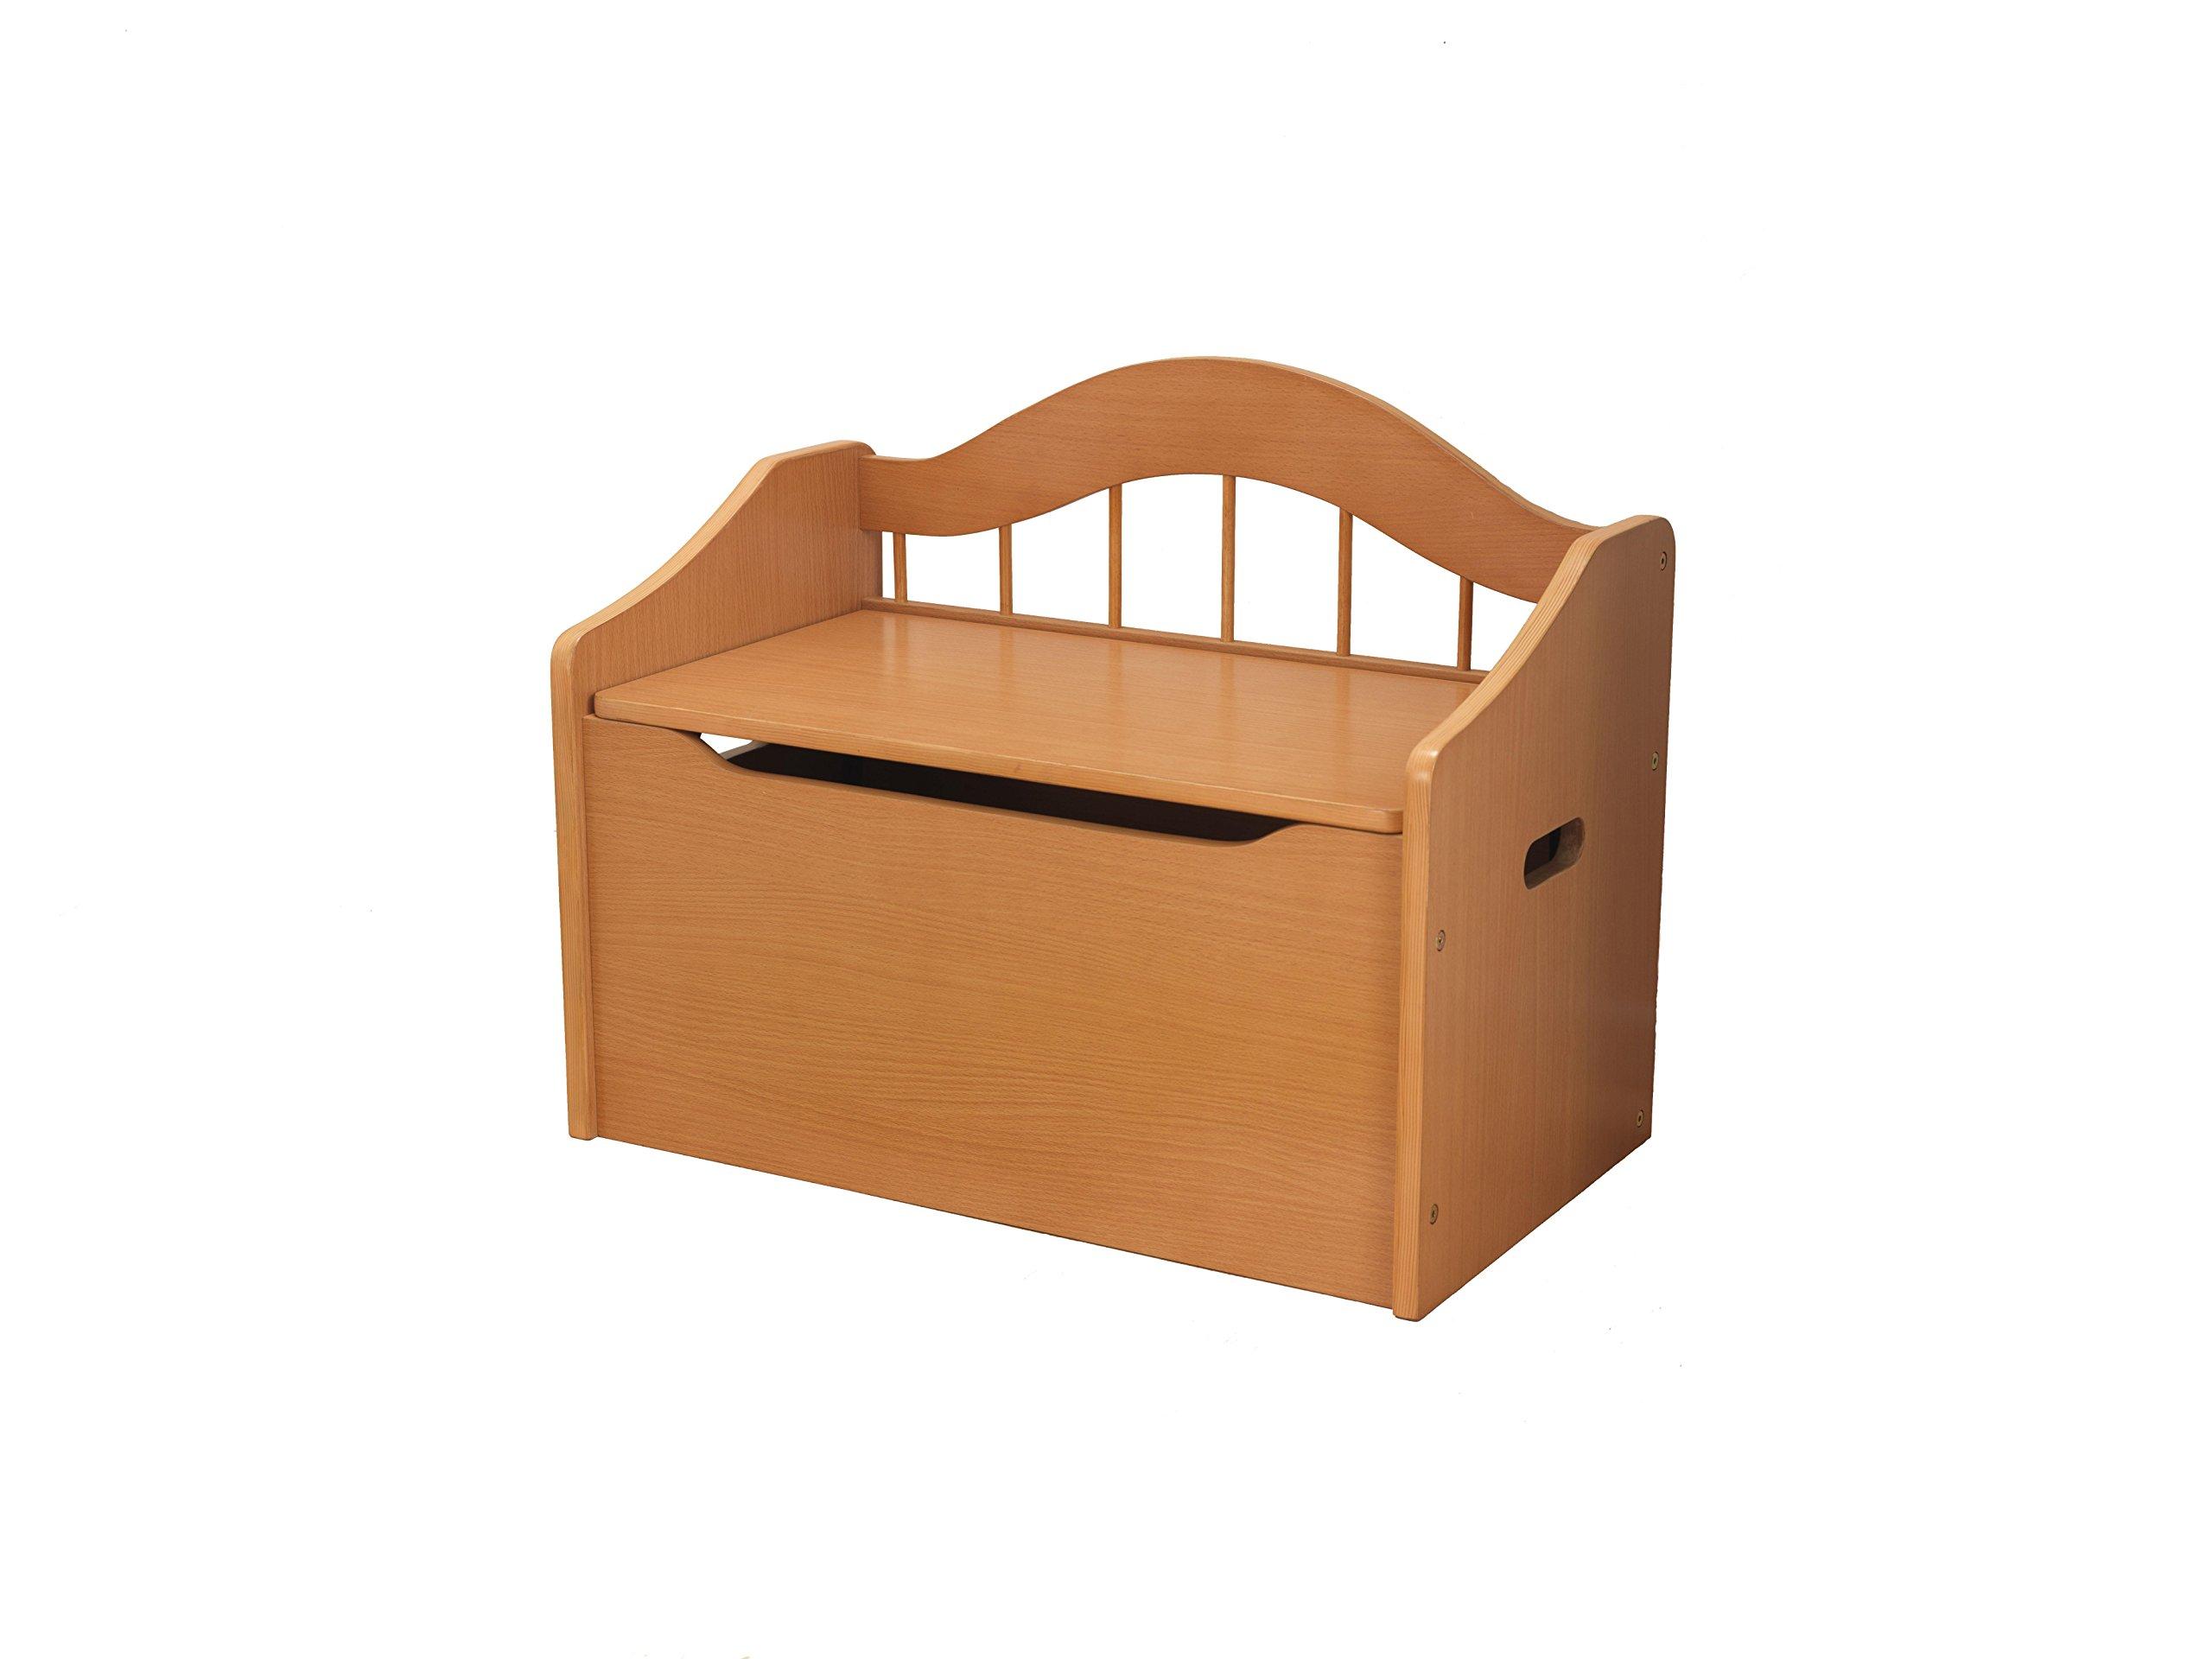 KidKraft Limited Edition Jr. Toy Box (Honey)